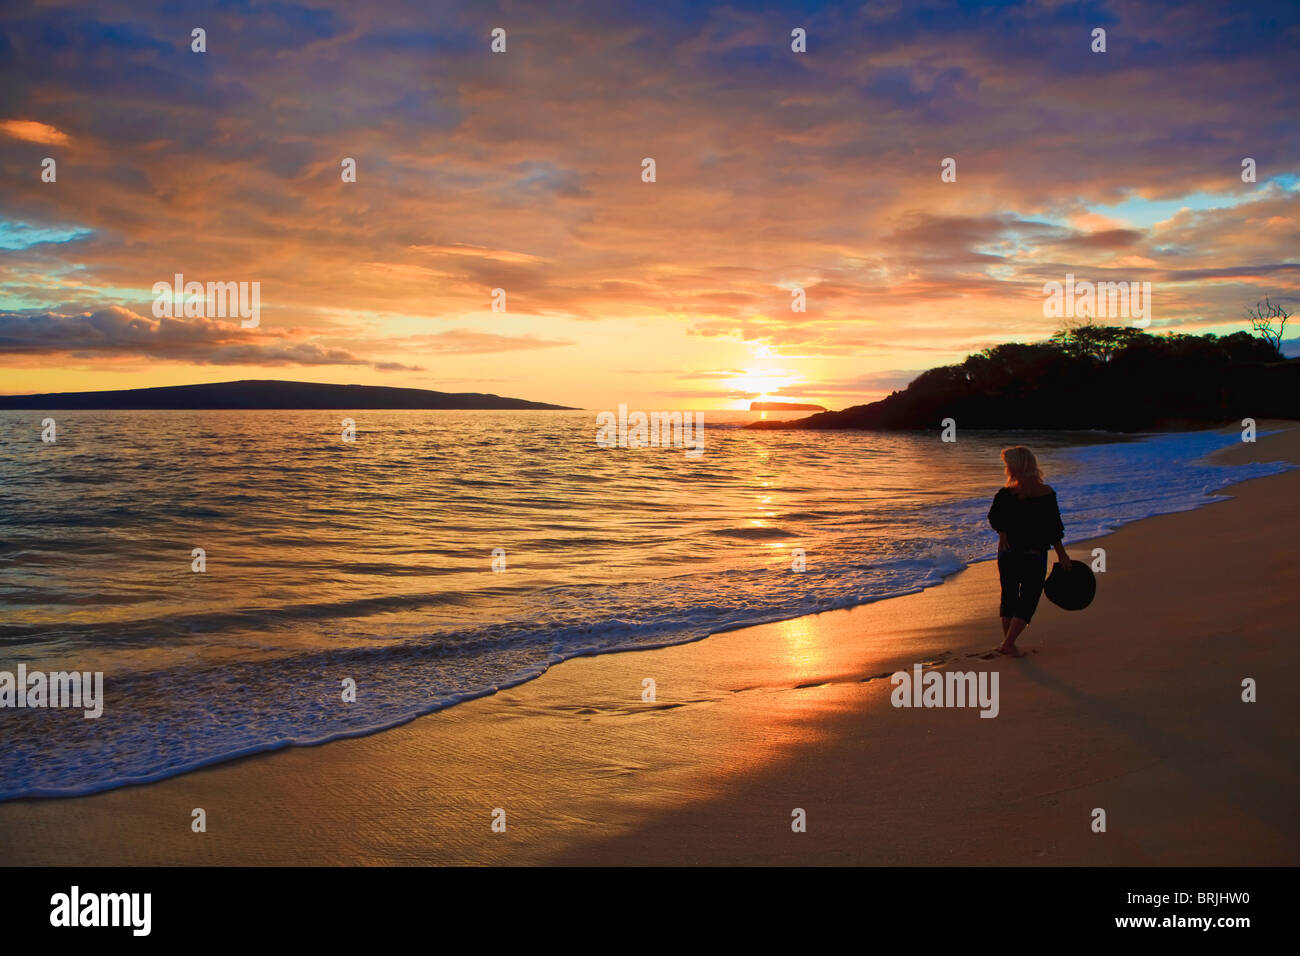 beautiful middle age woman walking on the shore alone on makena beach, maui at sunset - Stock Image